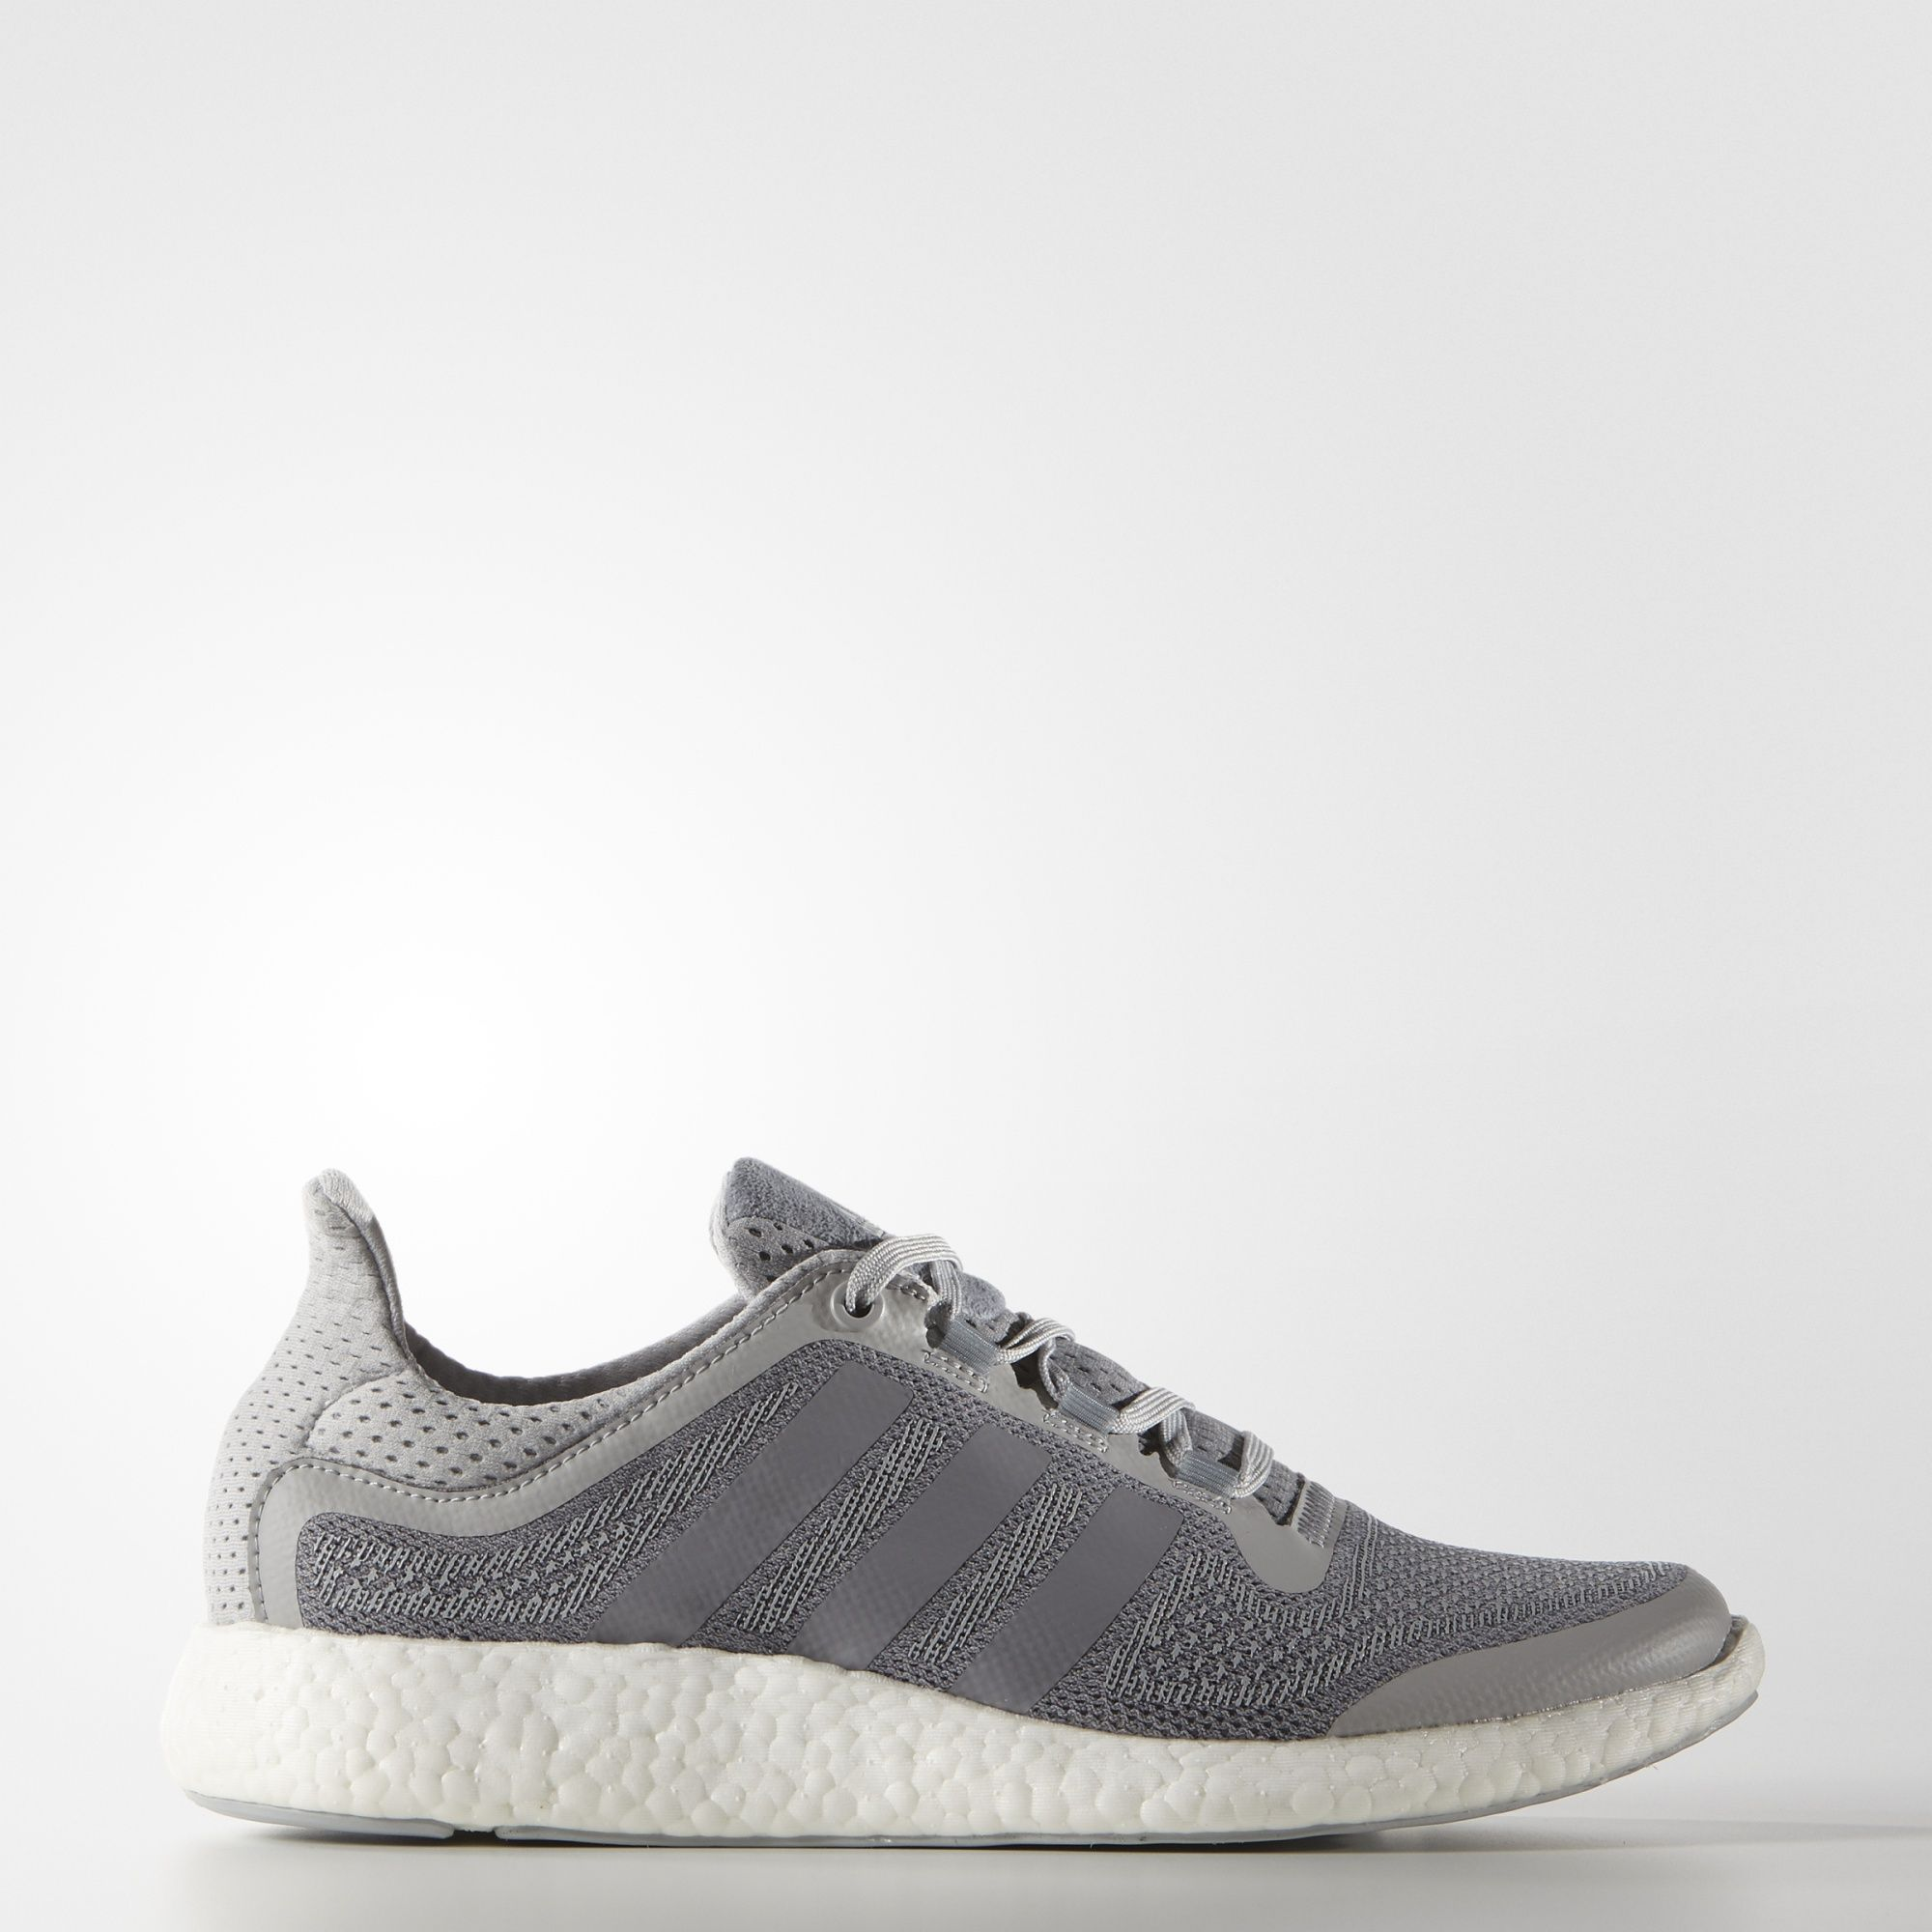 Adidas pureboost 2 m sepatu Pinterest Adidas, ajuste perfecto y